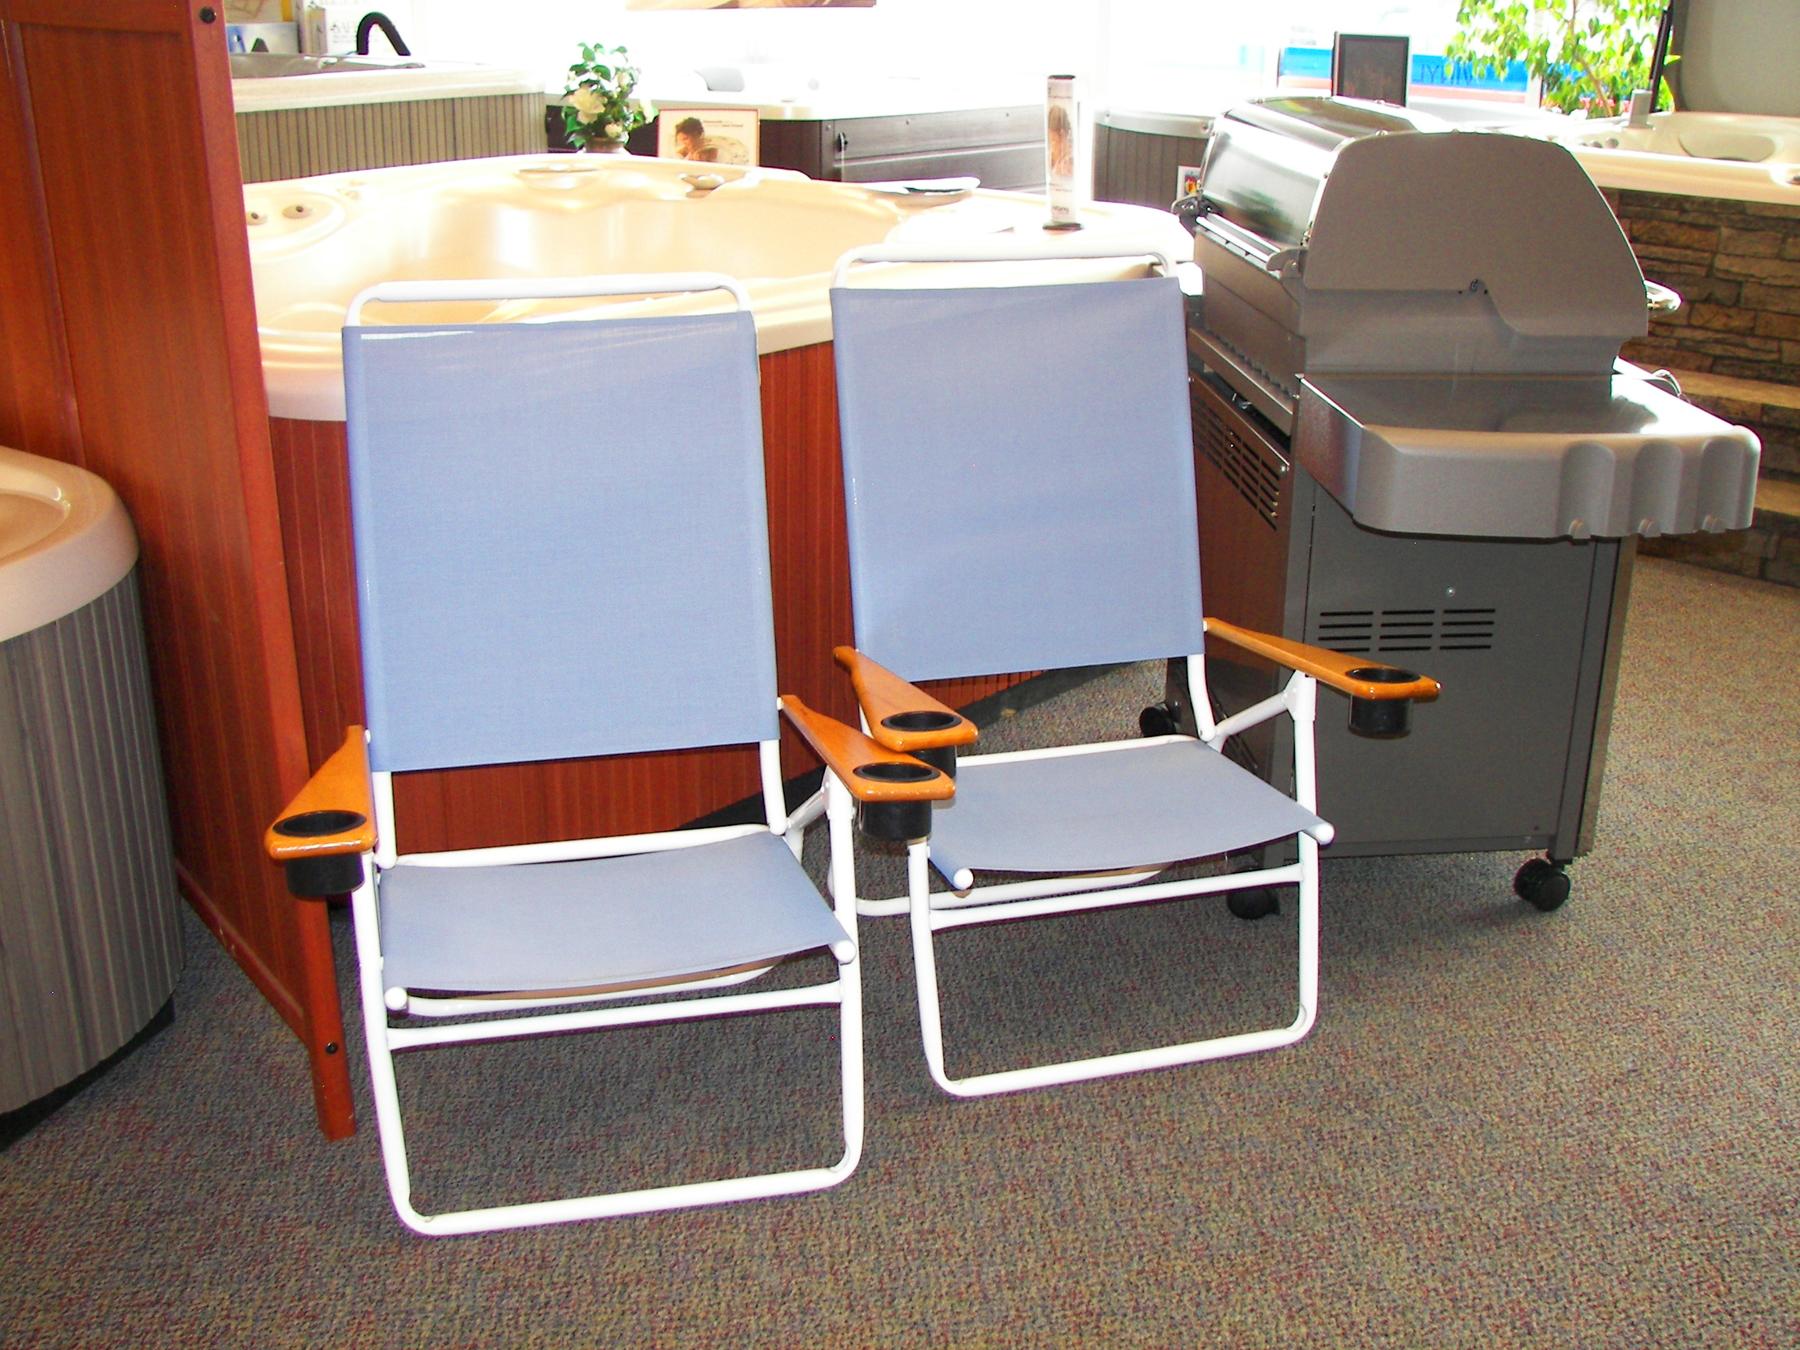 Request A Price Quote Patio Furniture Pool World Spokane